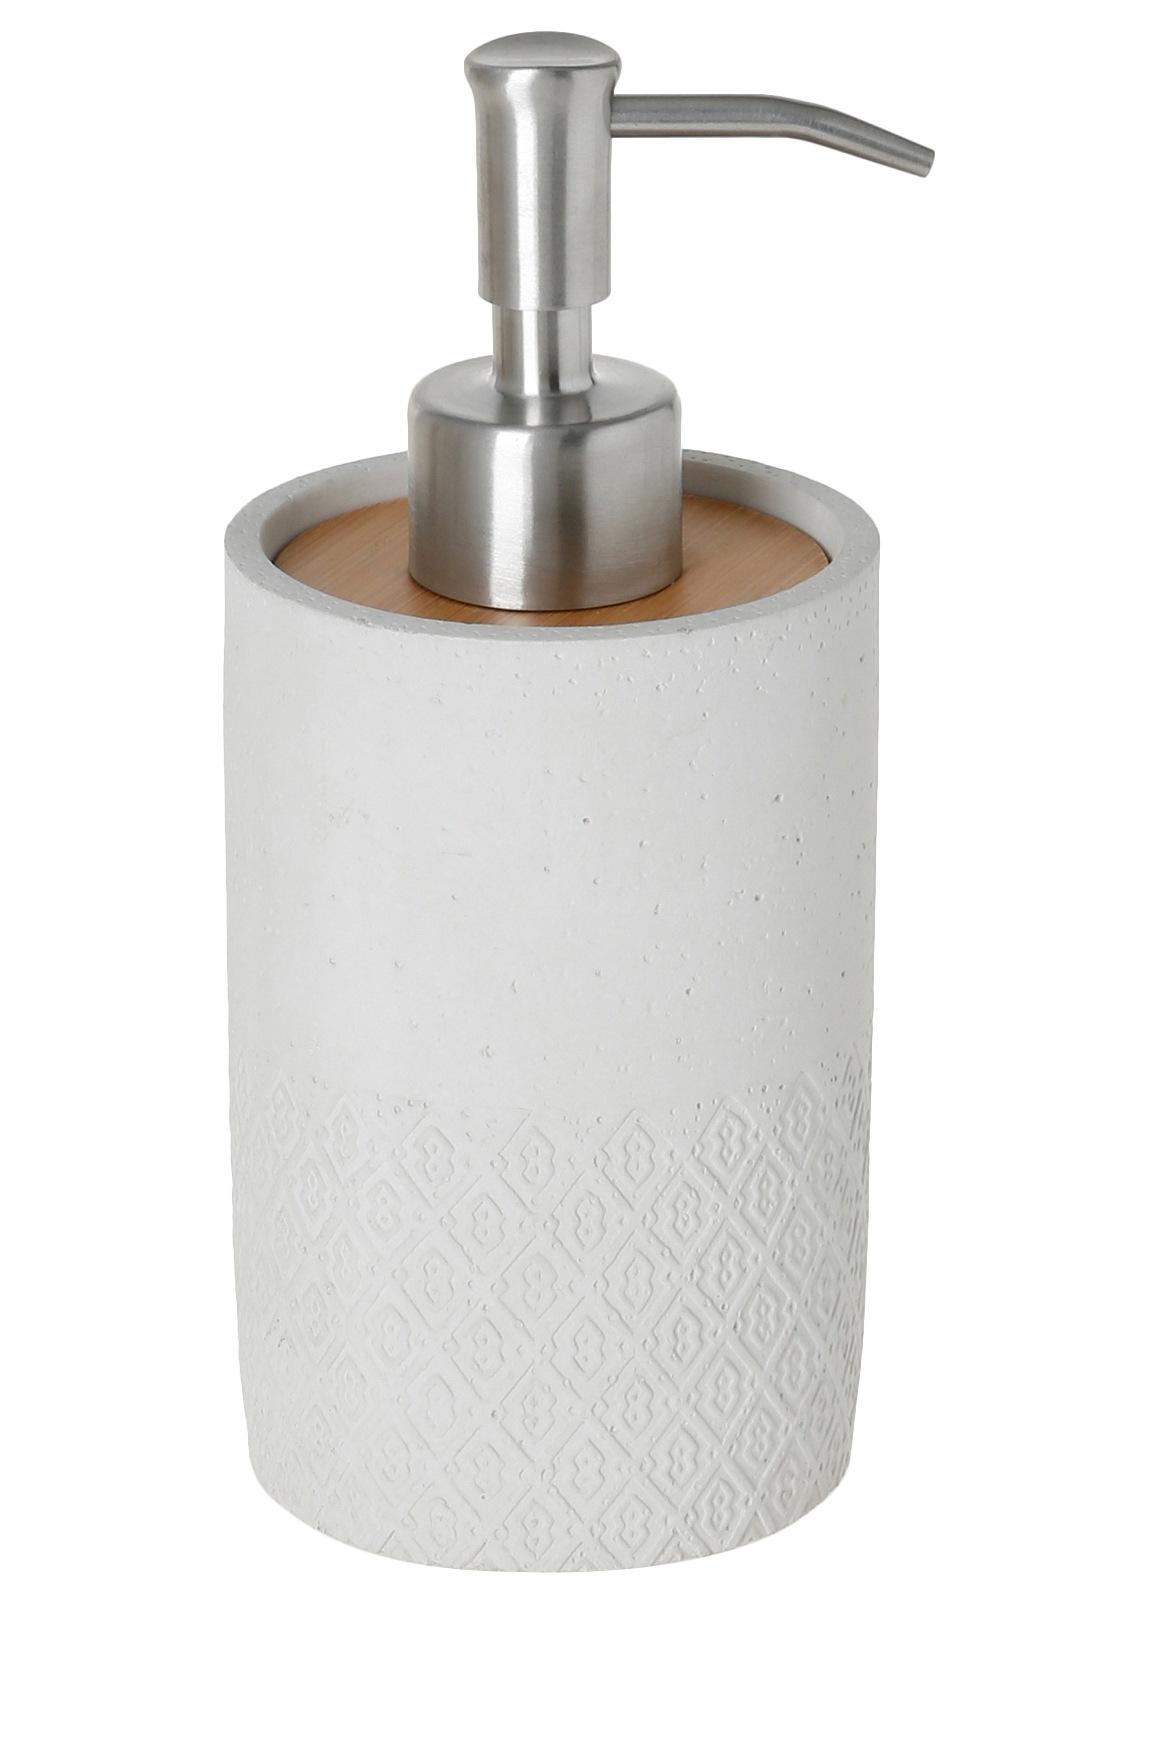 Australian house garden hahndorf bathroom accessories for Bathroom accessories australia